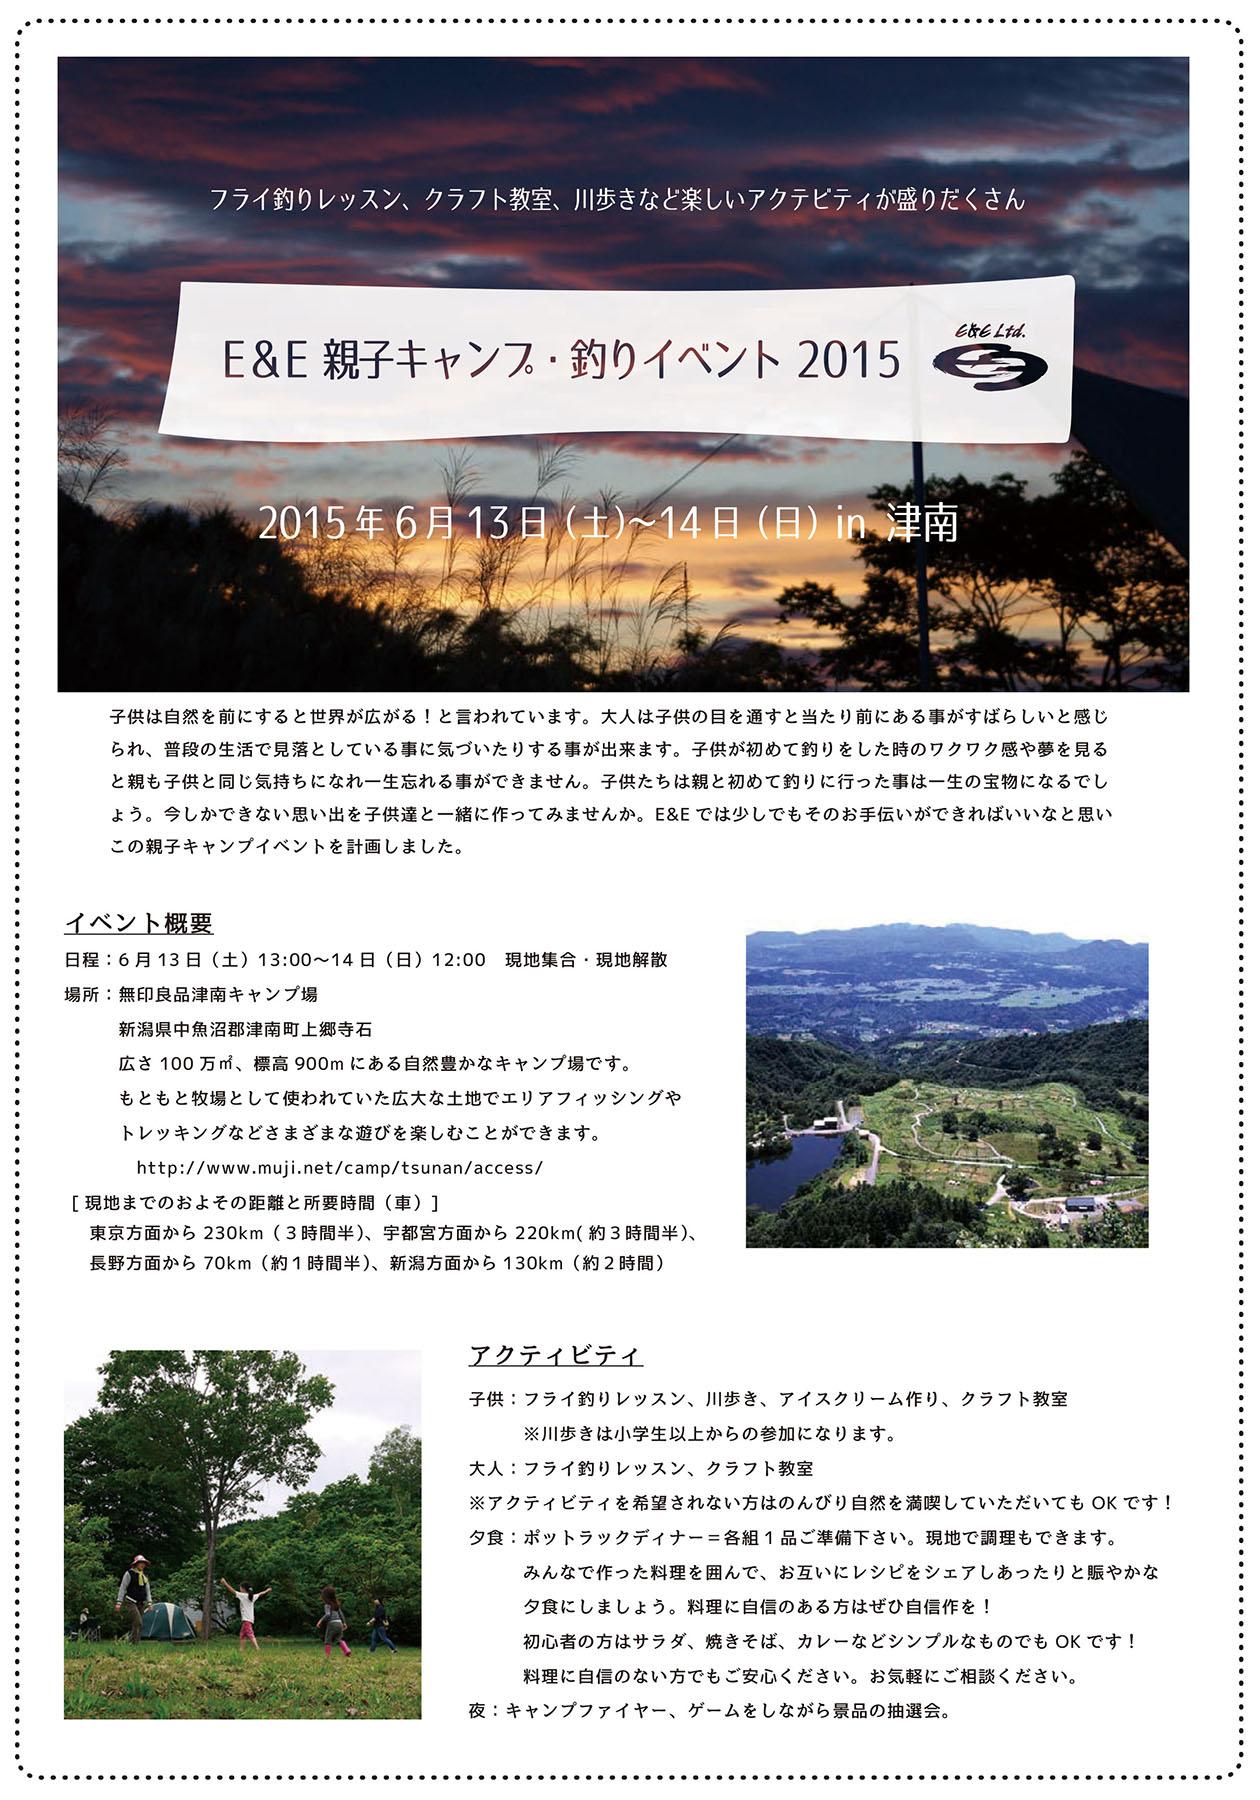 「E&E親子キャンプ・釣りイベント2015」_c0127476_1203967.jpg